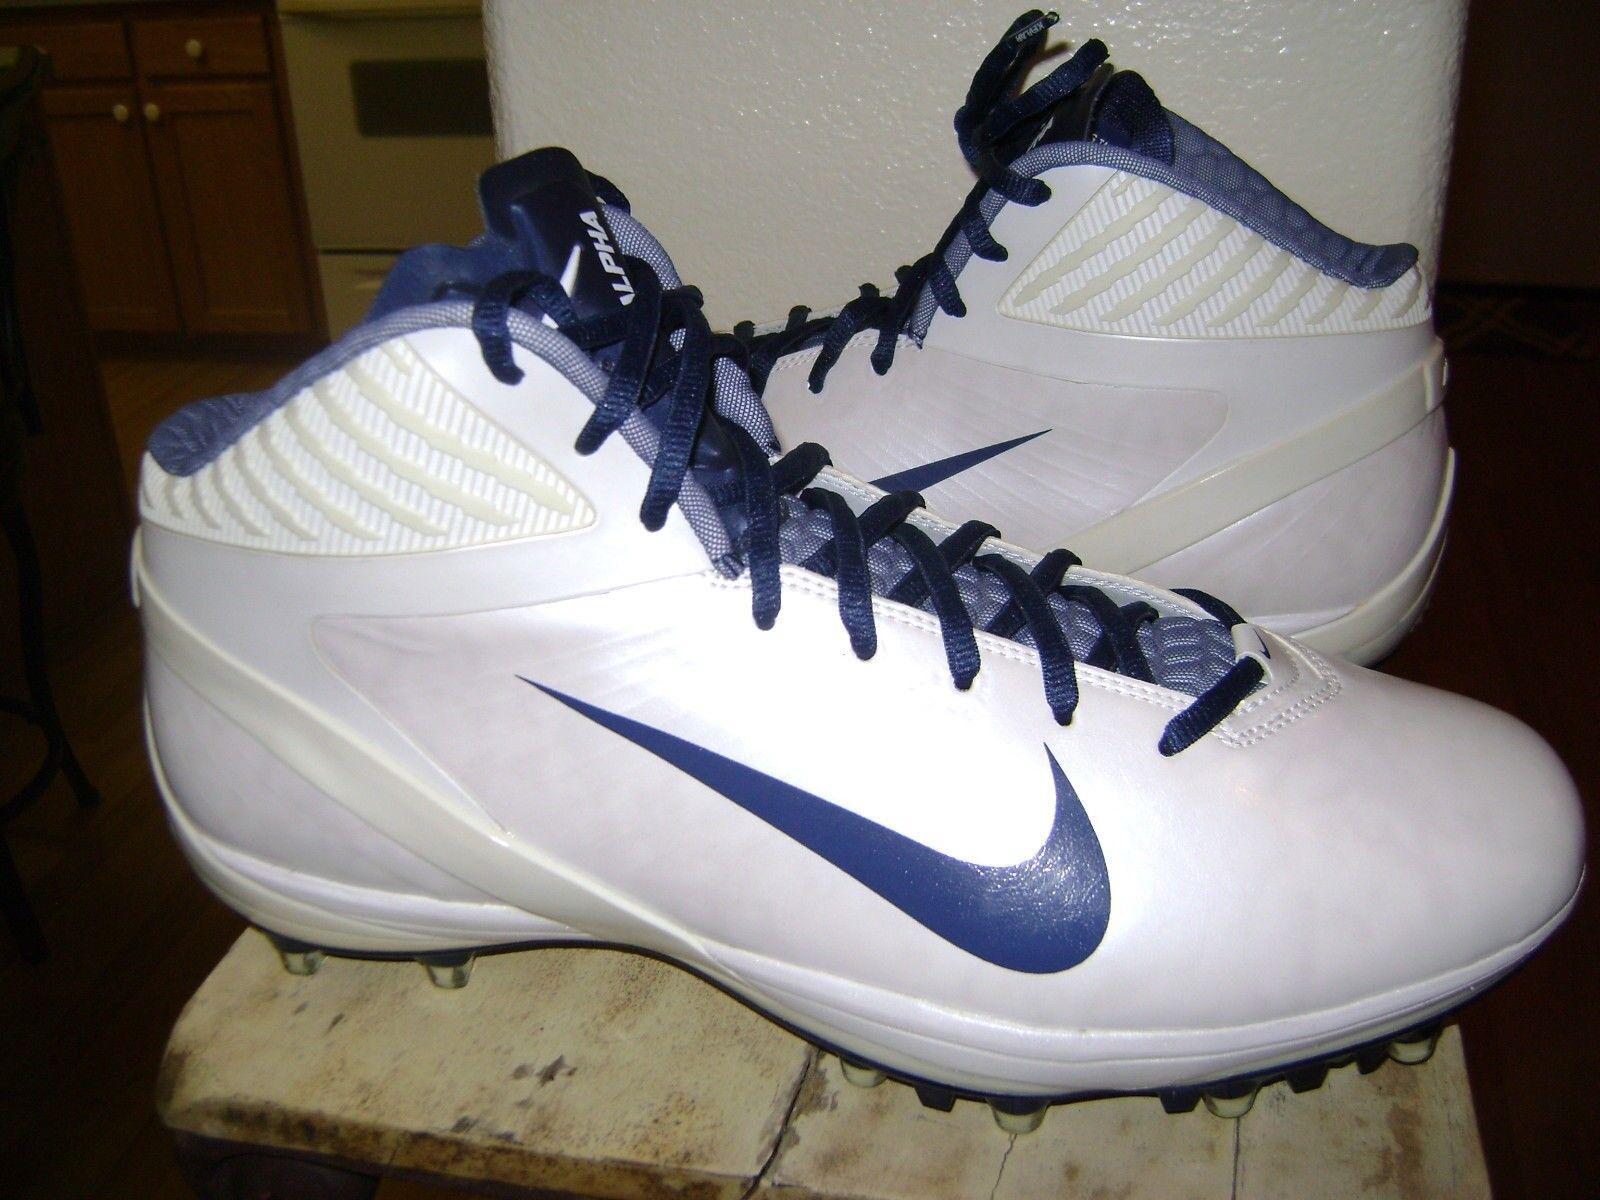 Nike Alpha Tebow Denver Broncos PE Player Talon Air Zoom Exclusive Cleats